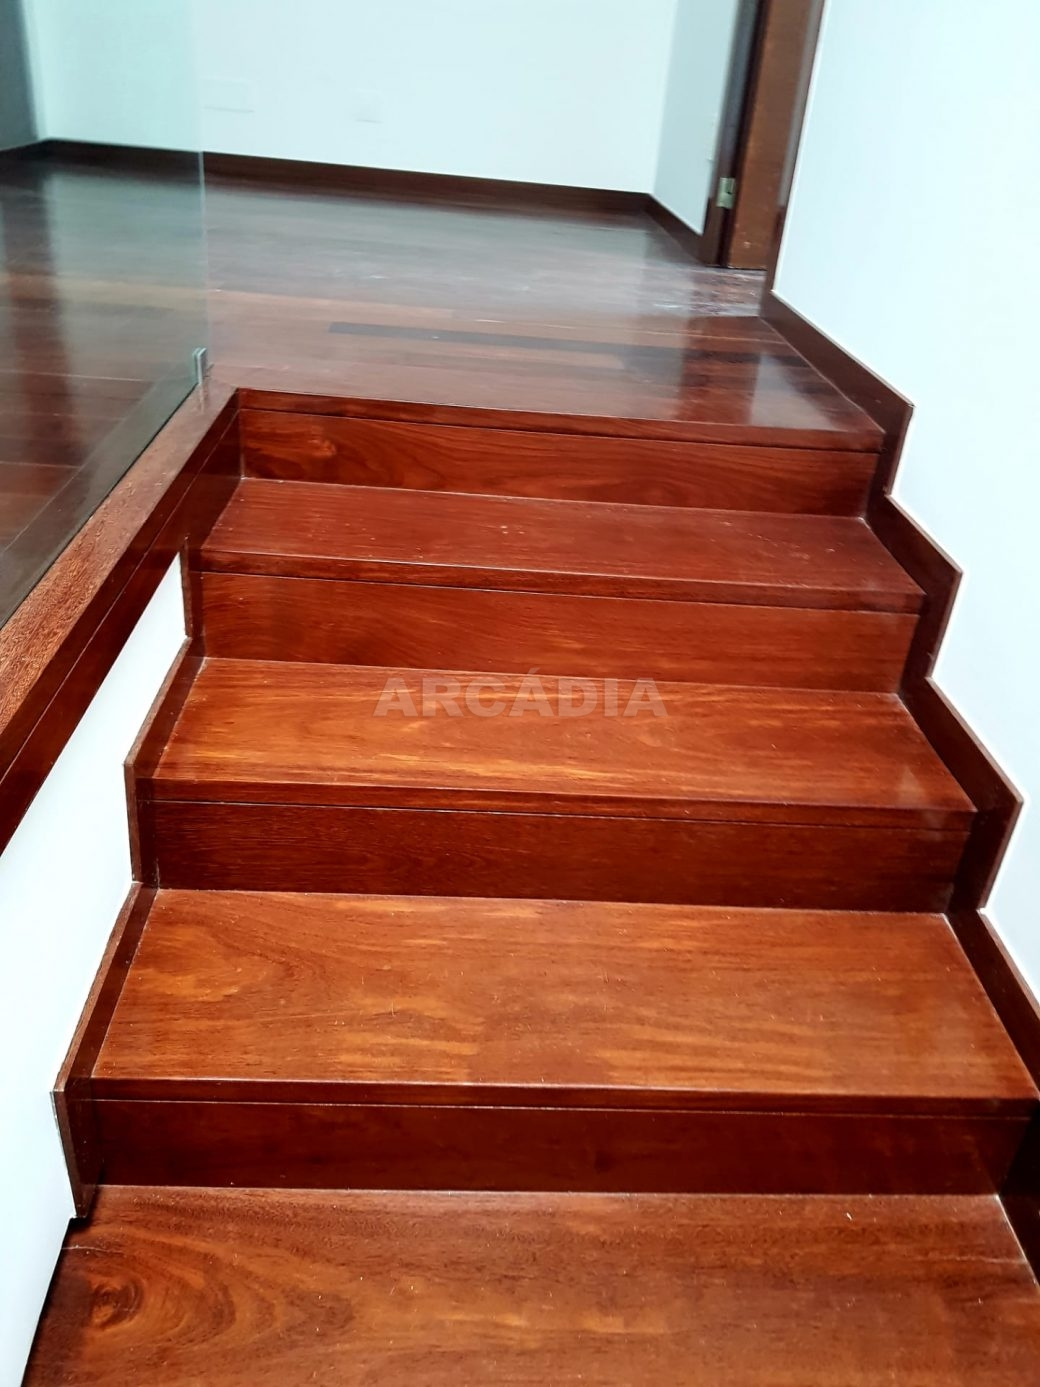 arcadia-imobiliaria-moradia-3665-511